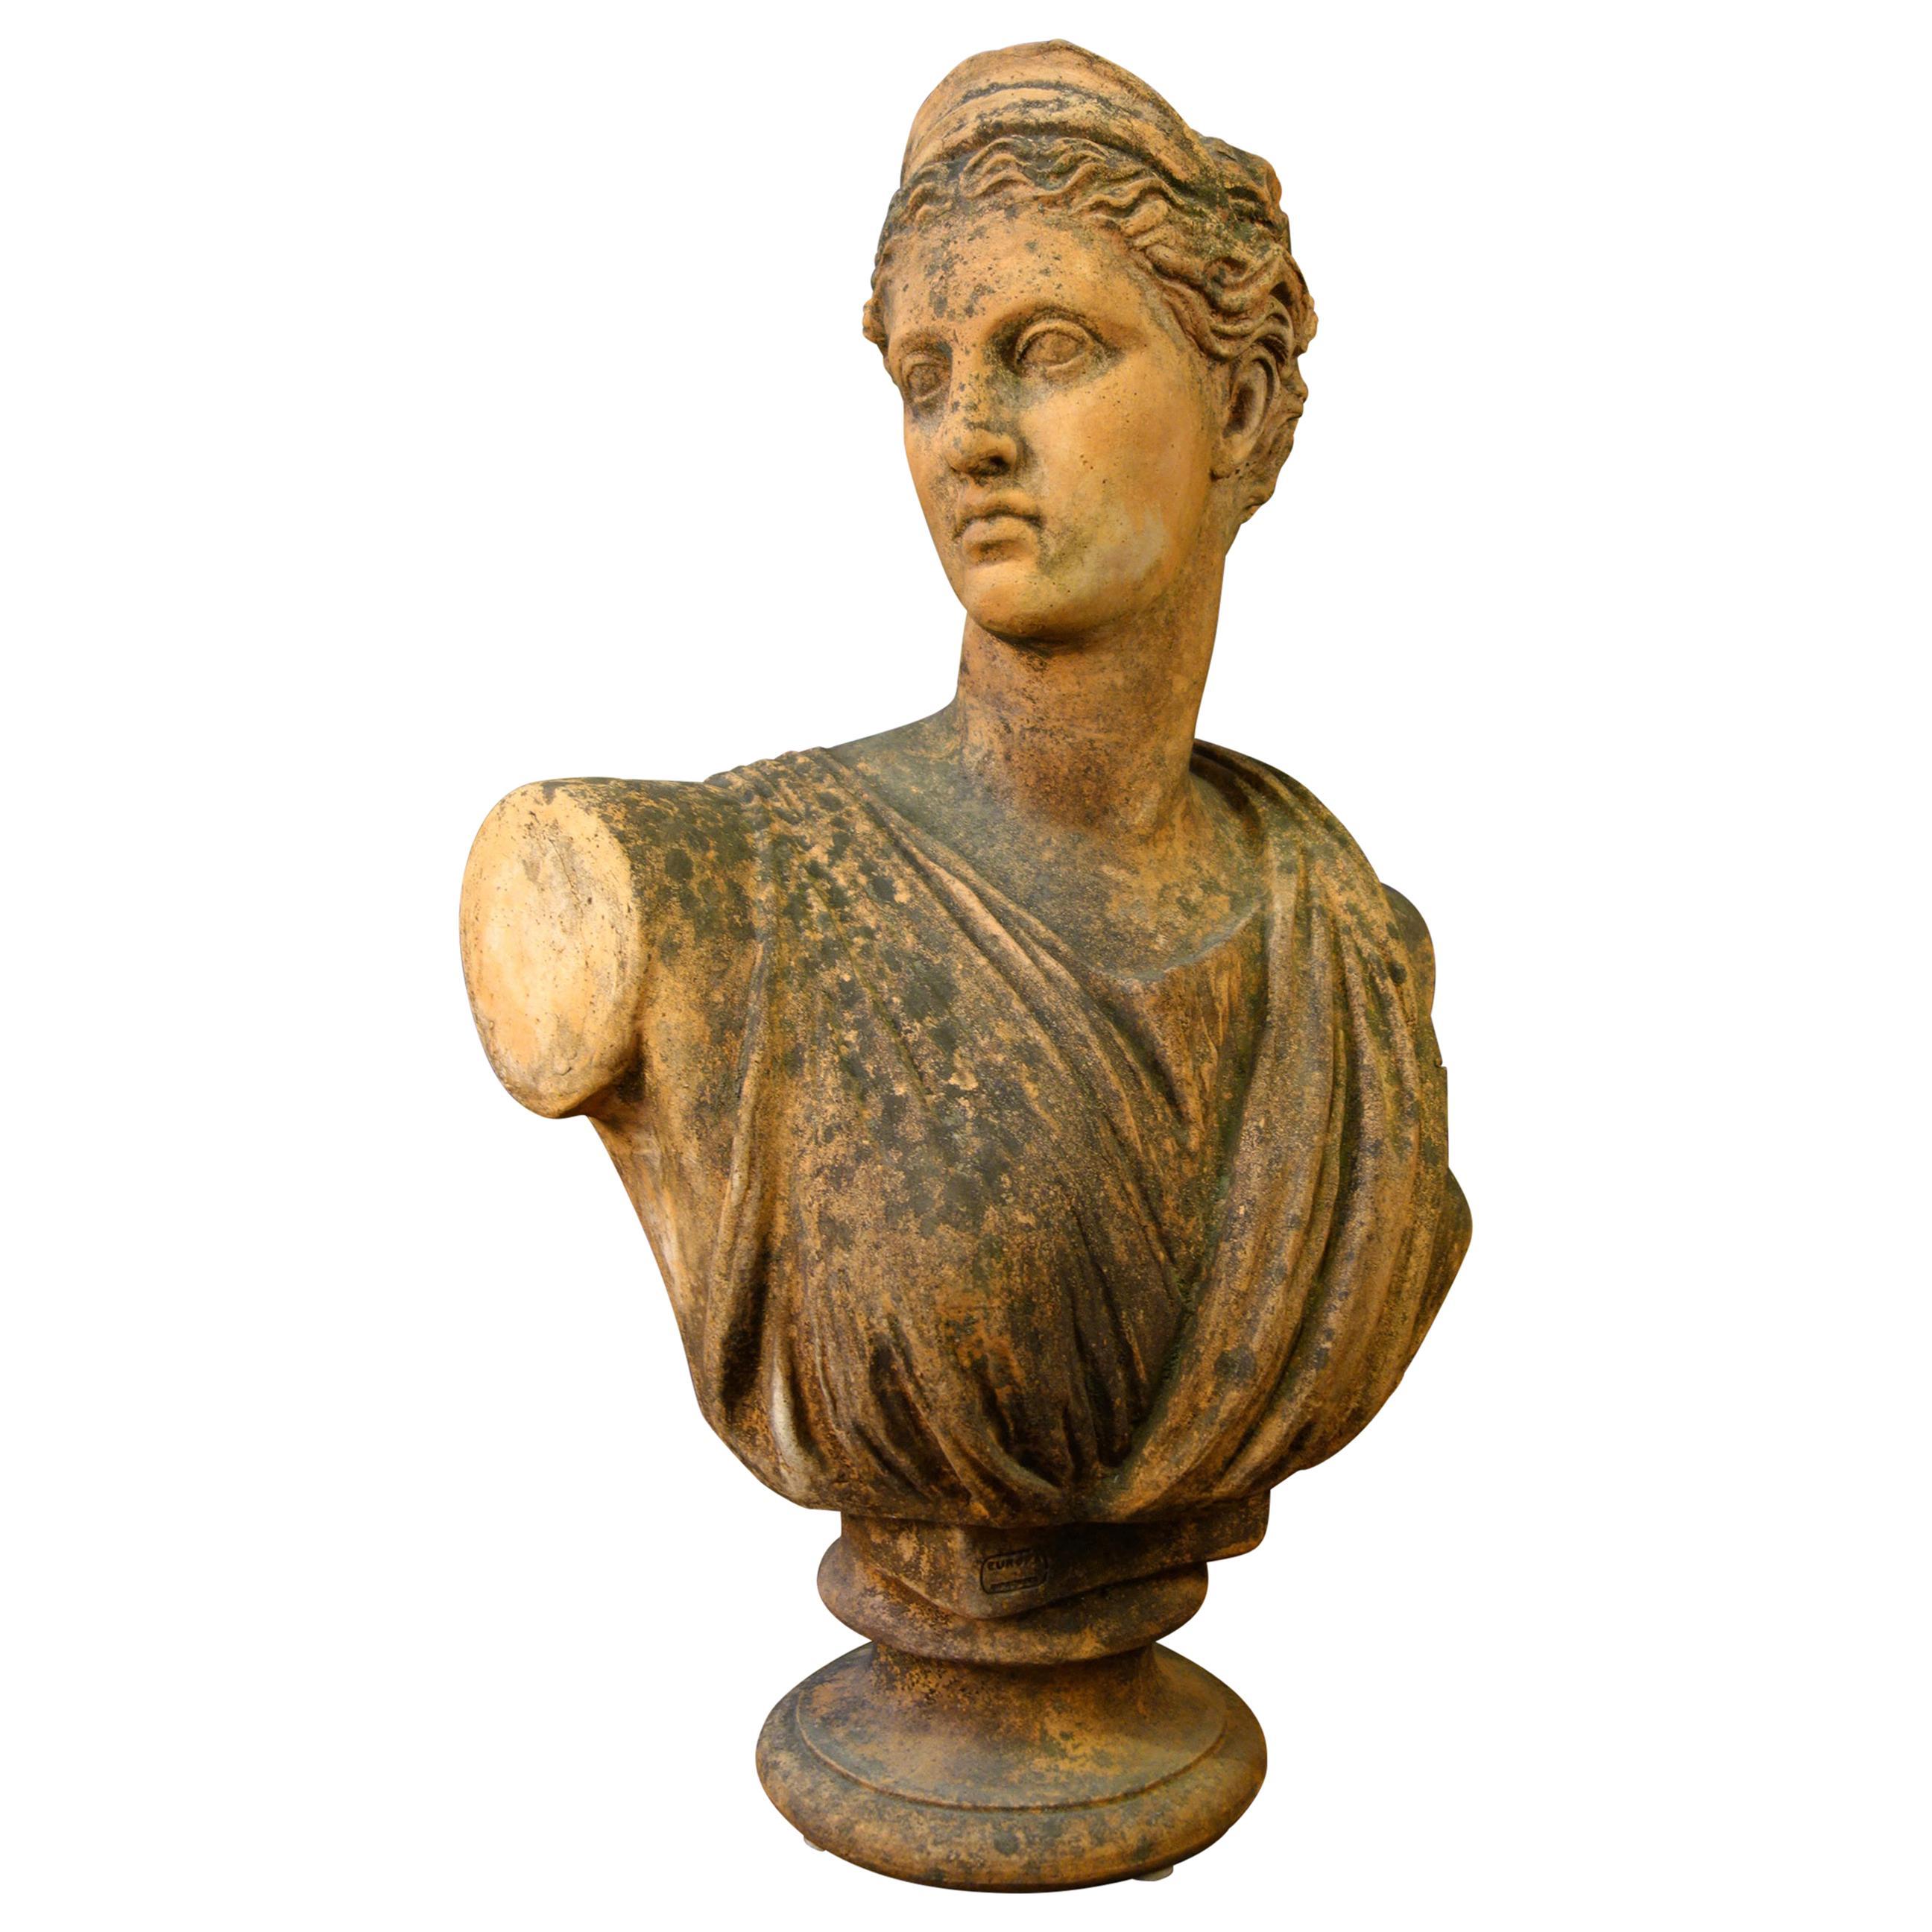 Late 19th Century Classical Roman Style Old Impruneta Terracotta Bust of Diana